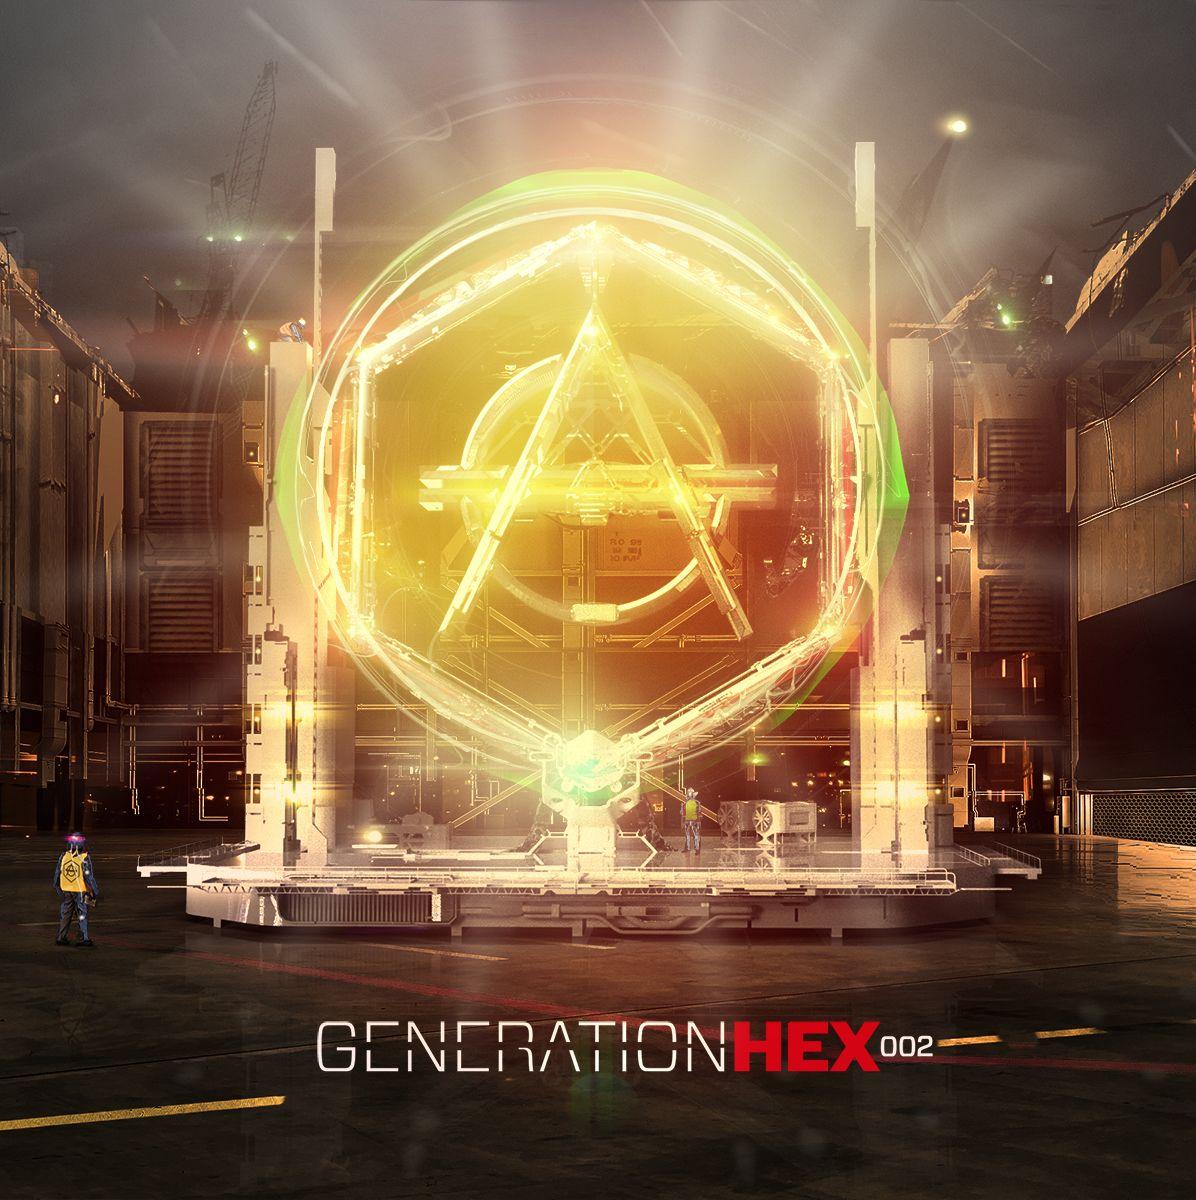 generationhex002.jpg